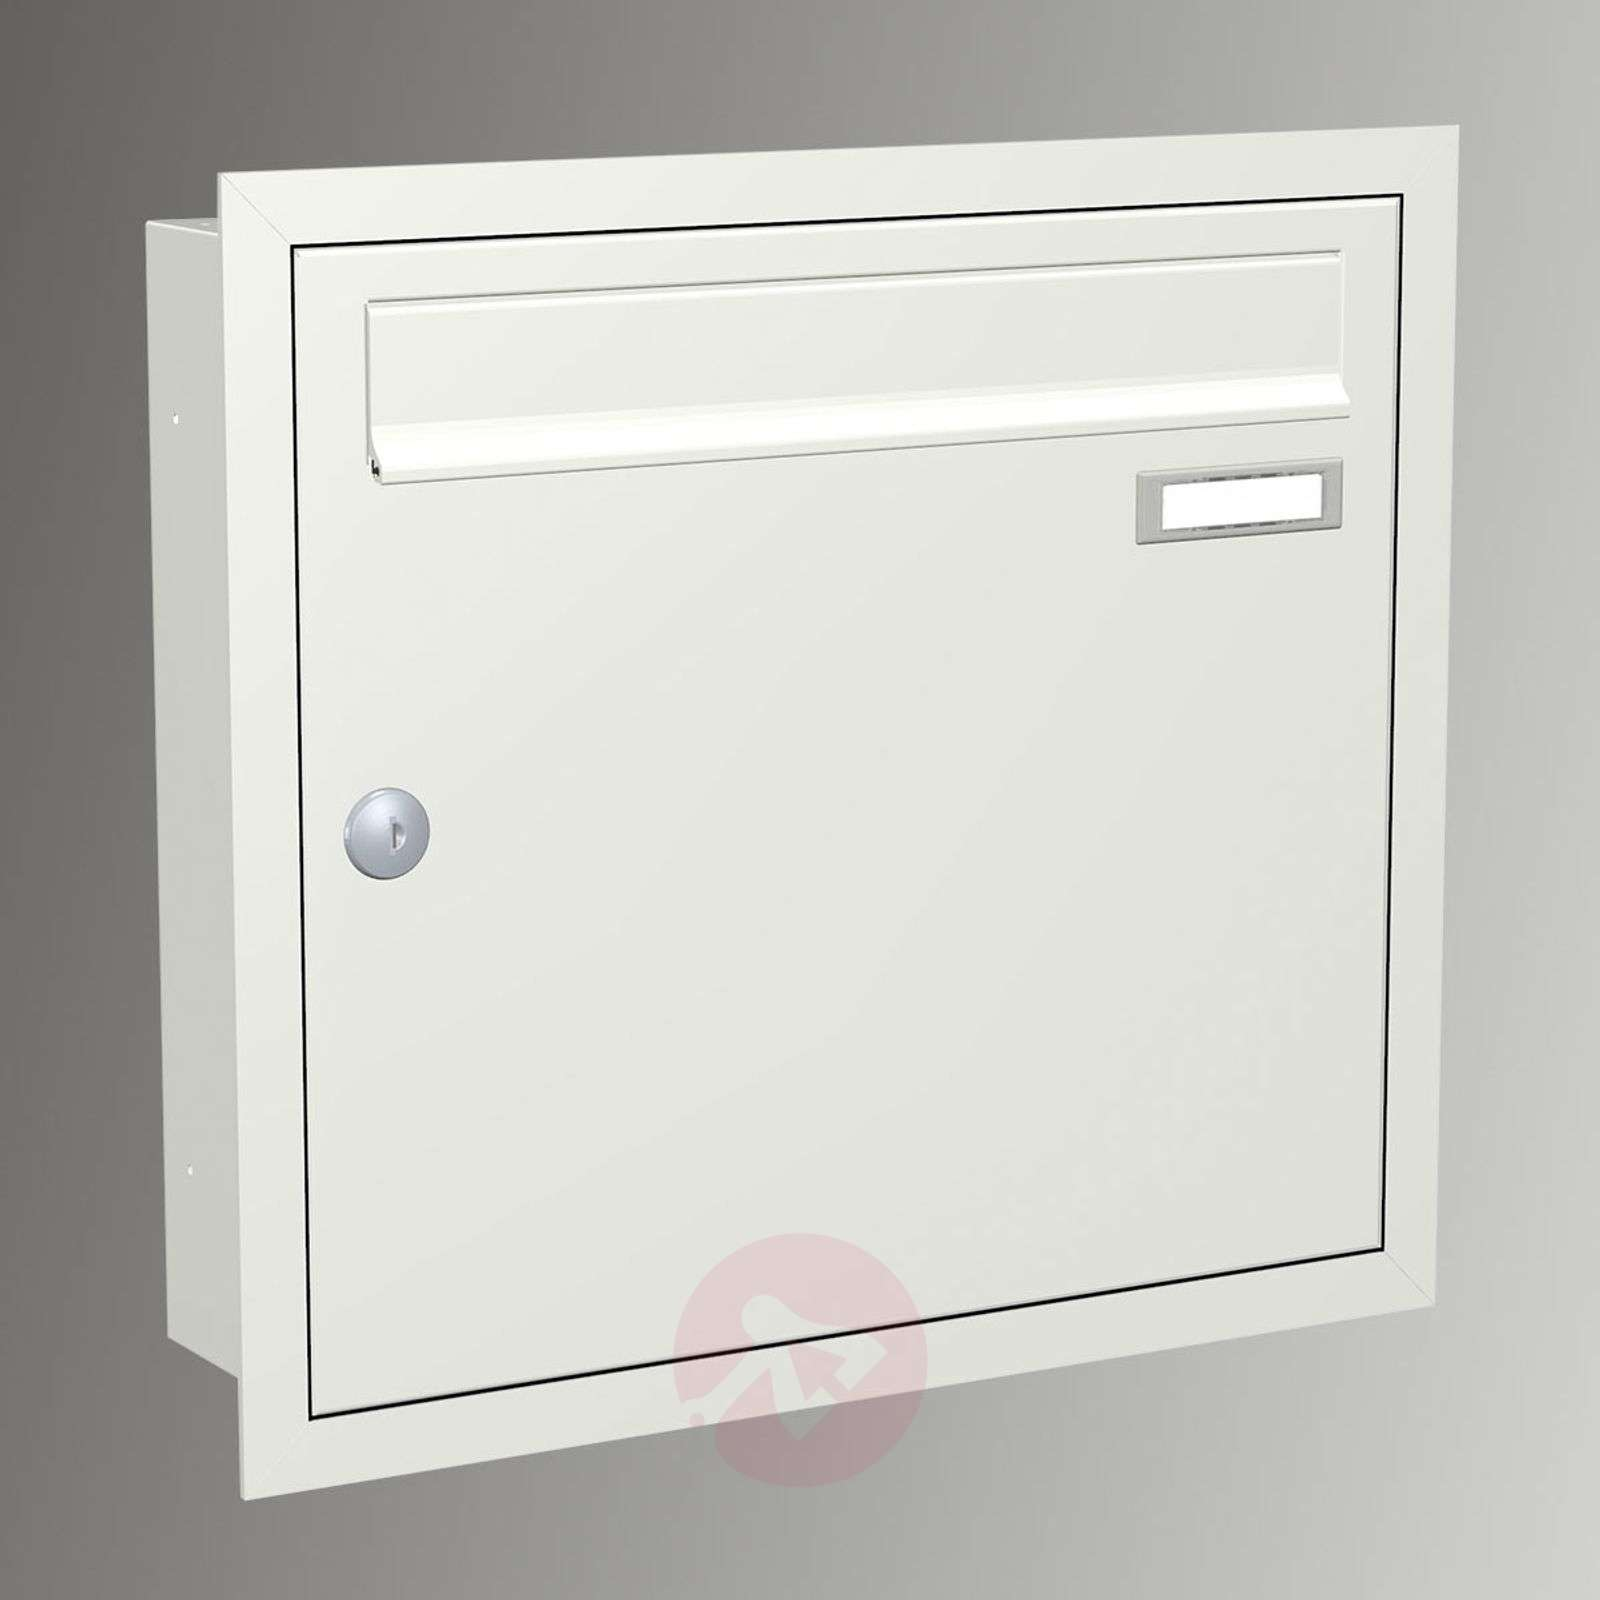 Express Box Up 110 flush-mounted letterbox white-5540031-01